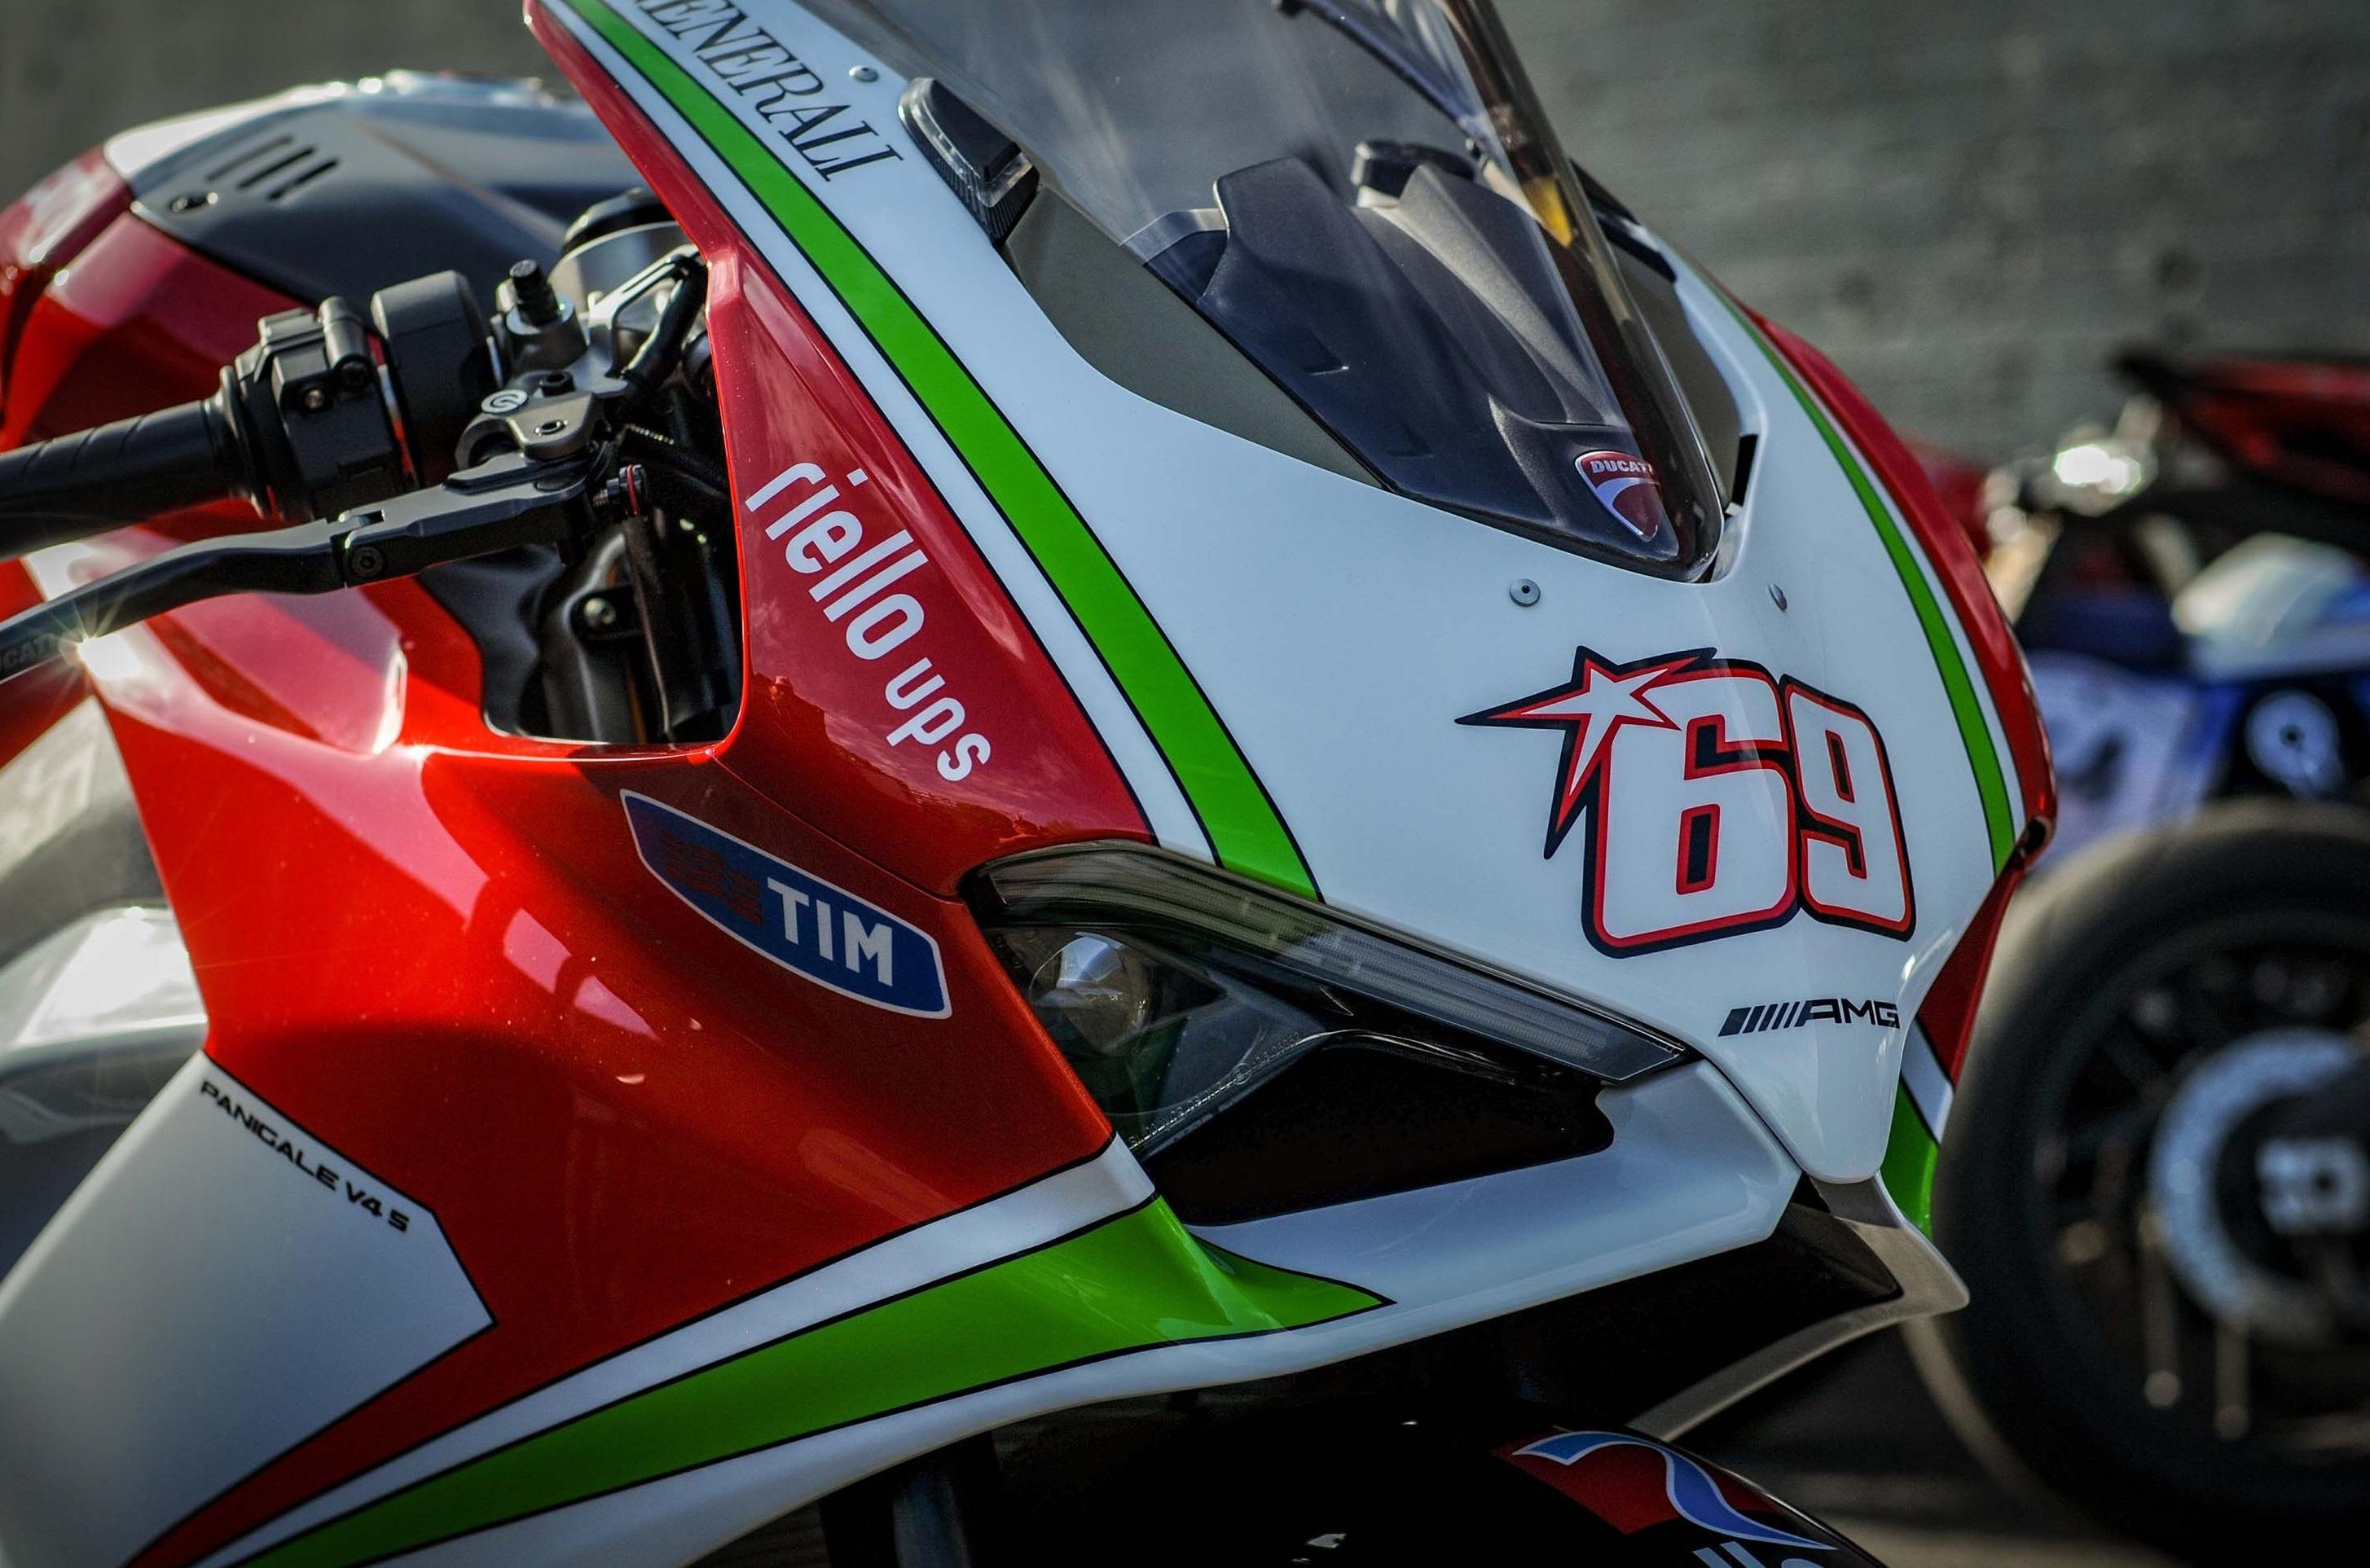 Ducati Panigale V4 Nicky Hayden Tribute